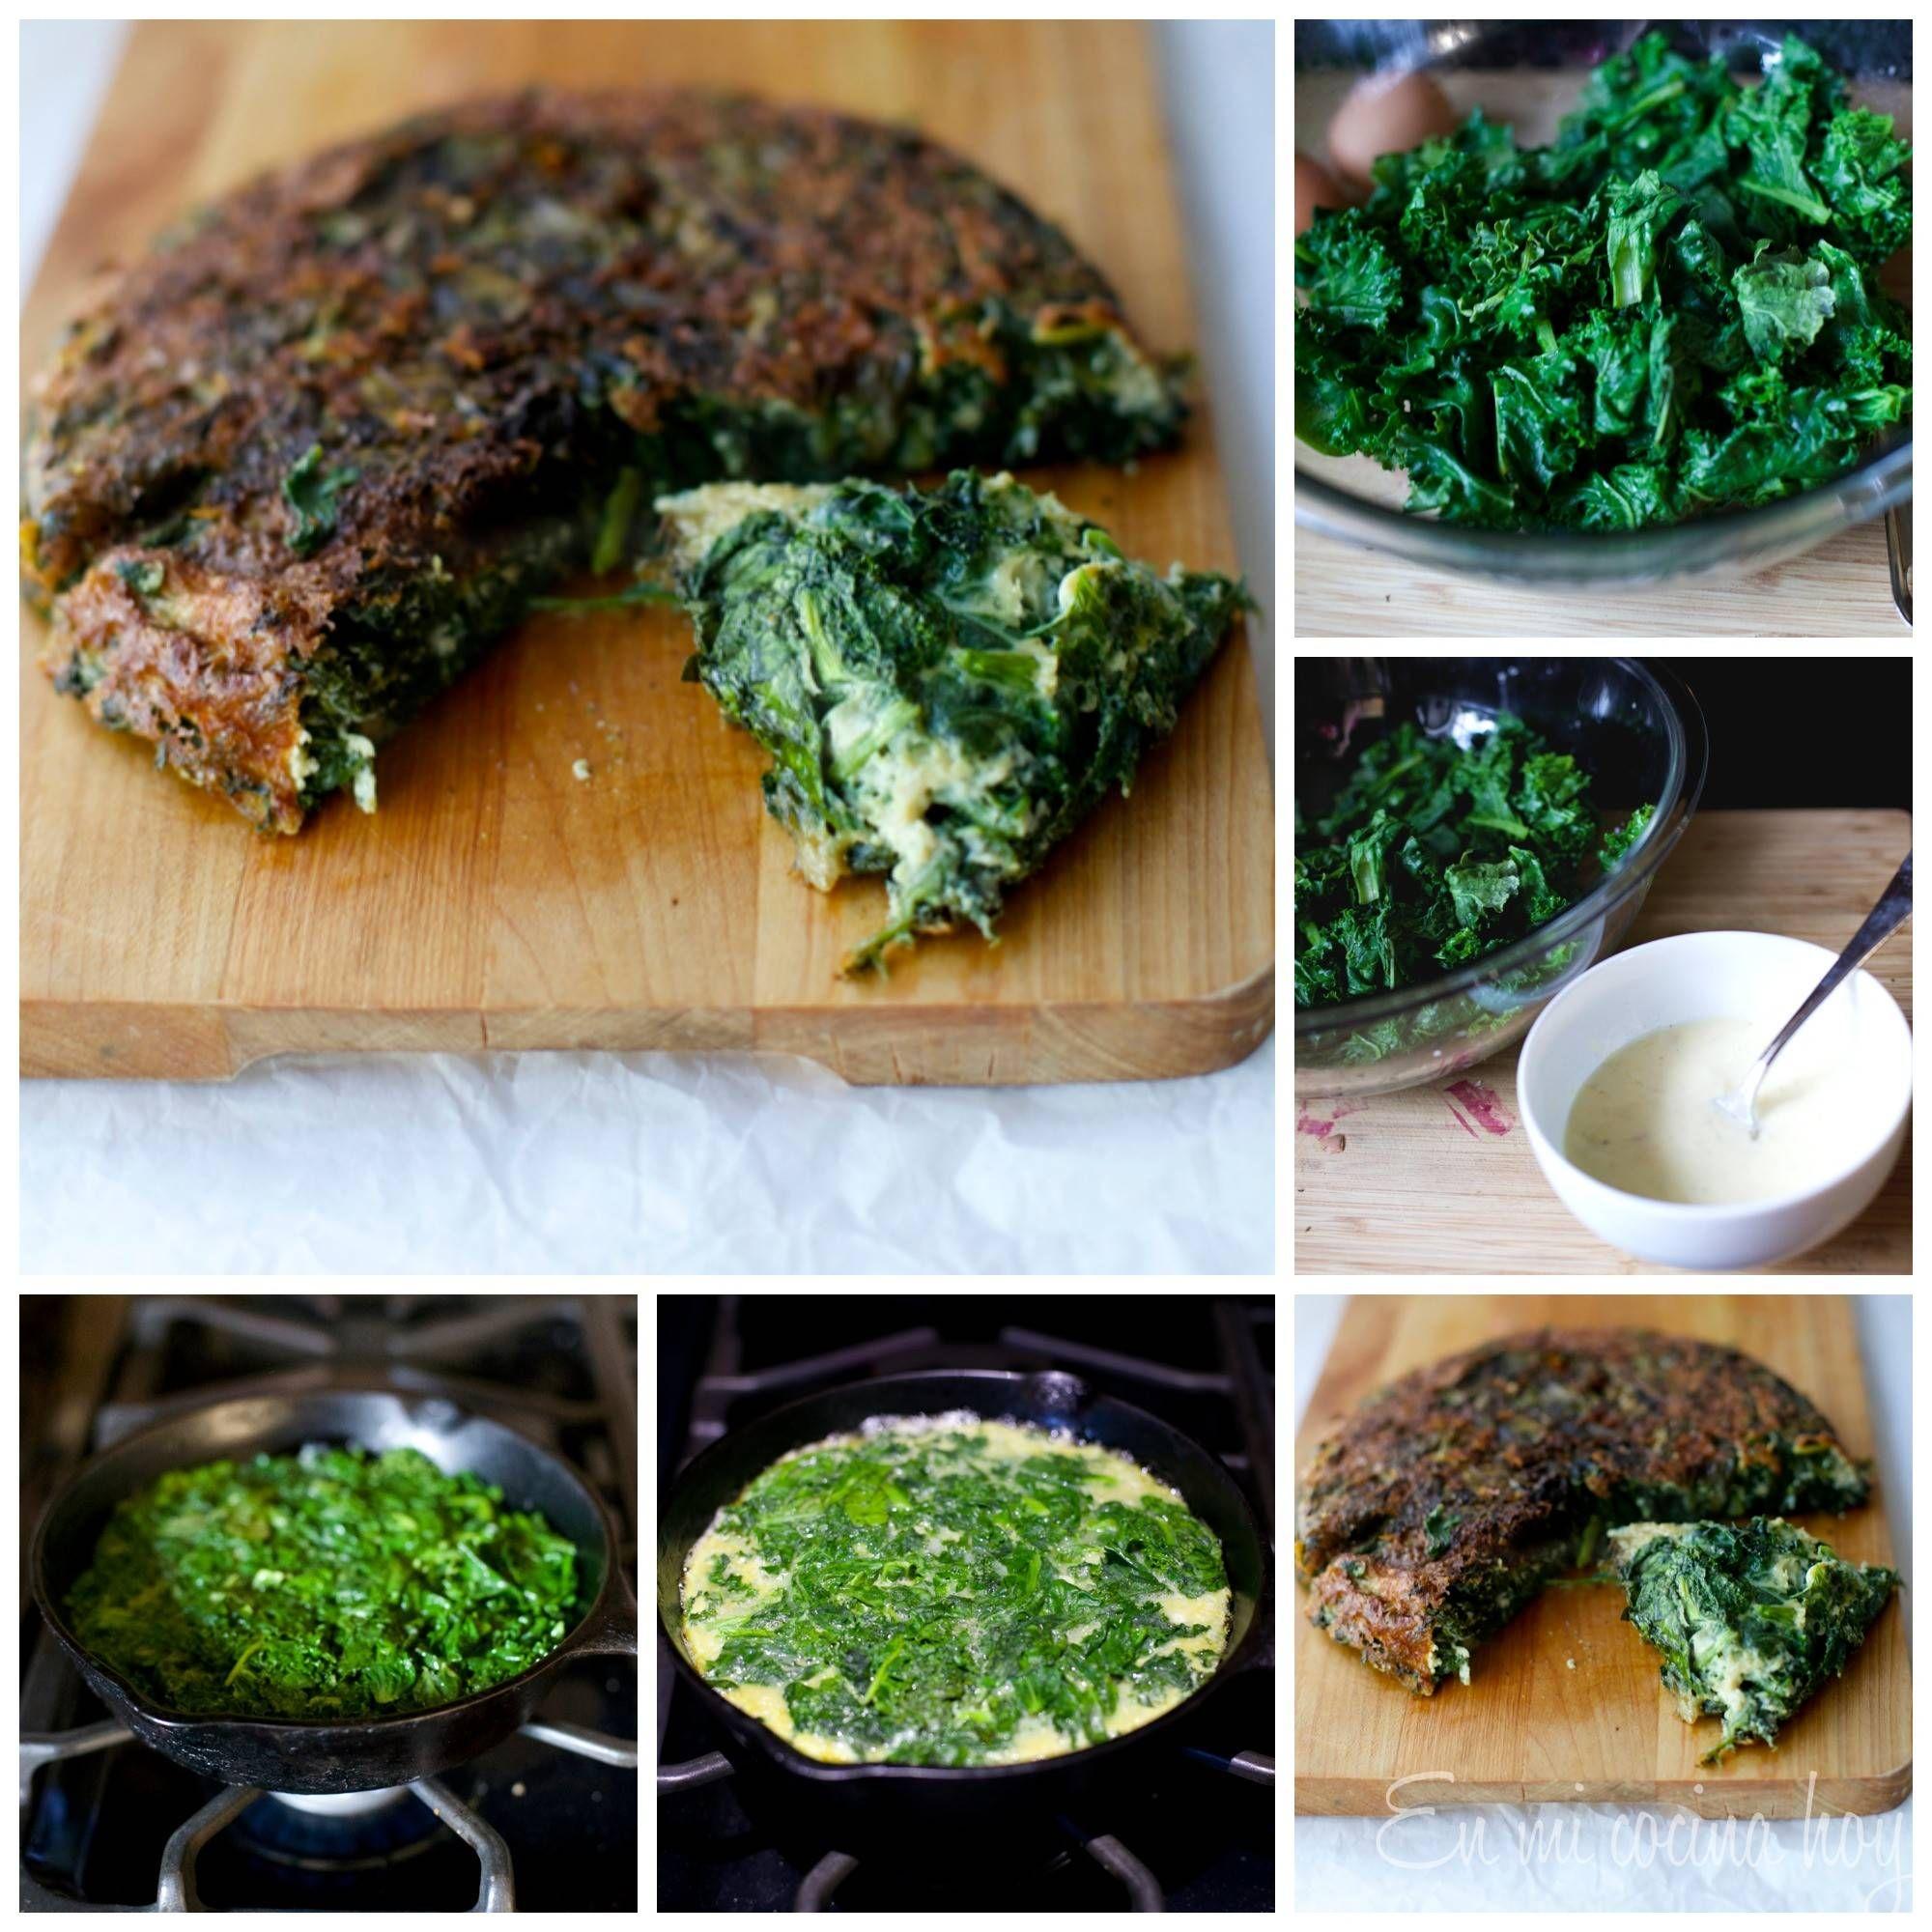 Tortilla De Espinacas En Mi Cocina Hoy Tortilla De Espinaca Espinacas Tortillas De Acelga